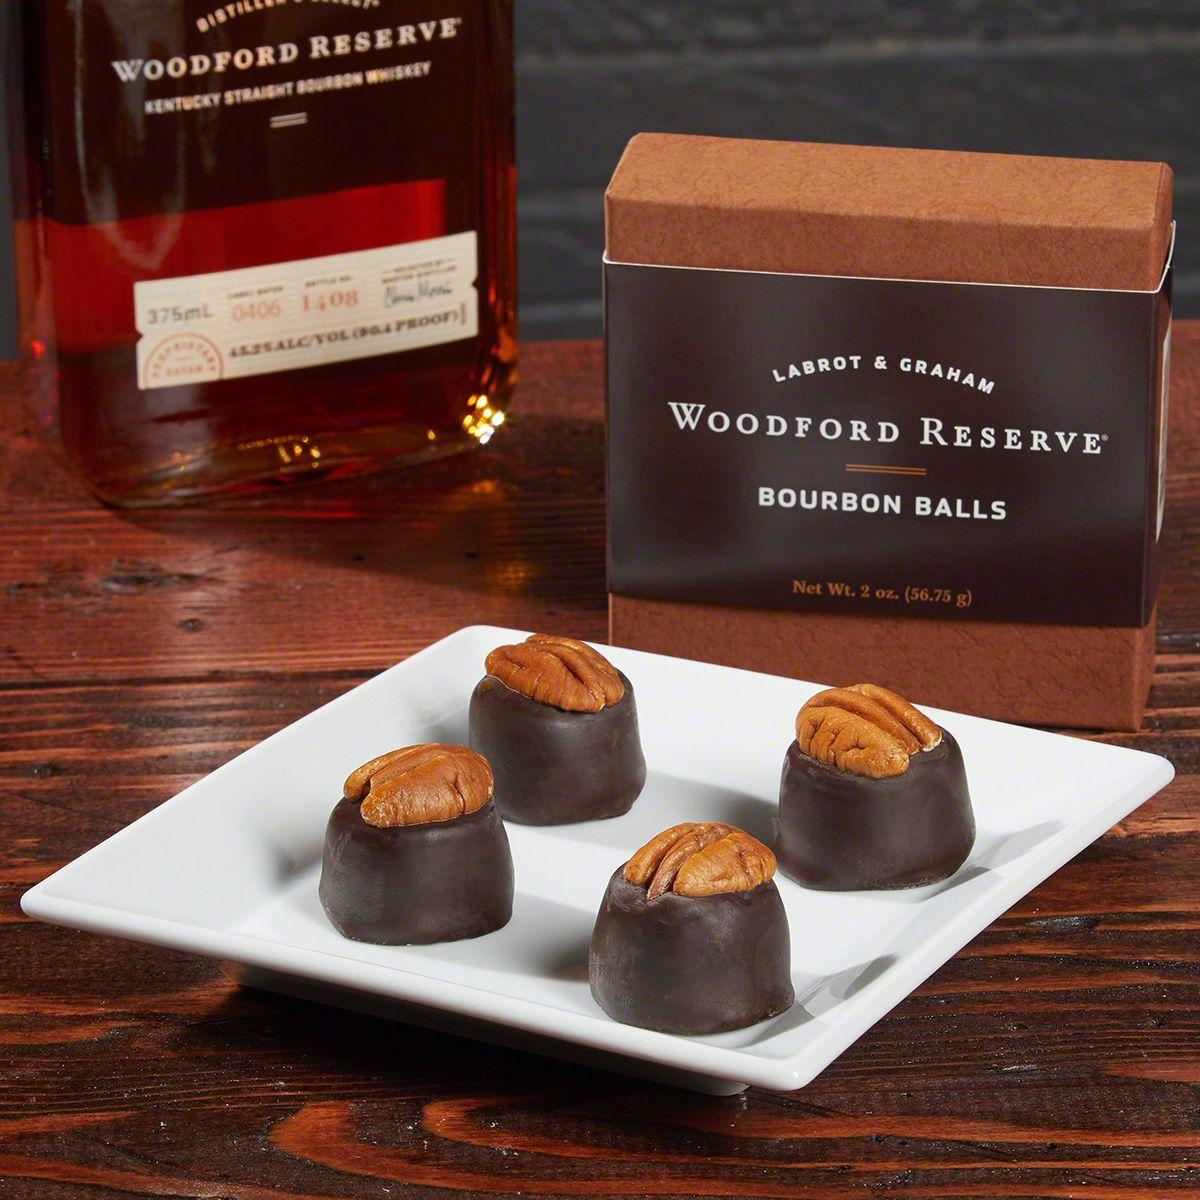 Woodford Reserve Bourbon Balls